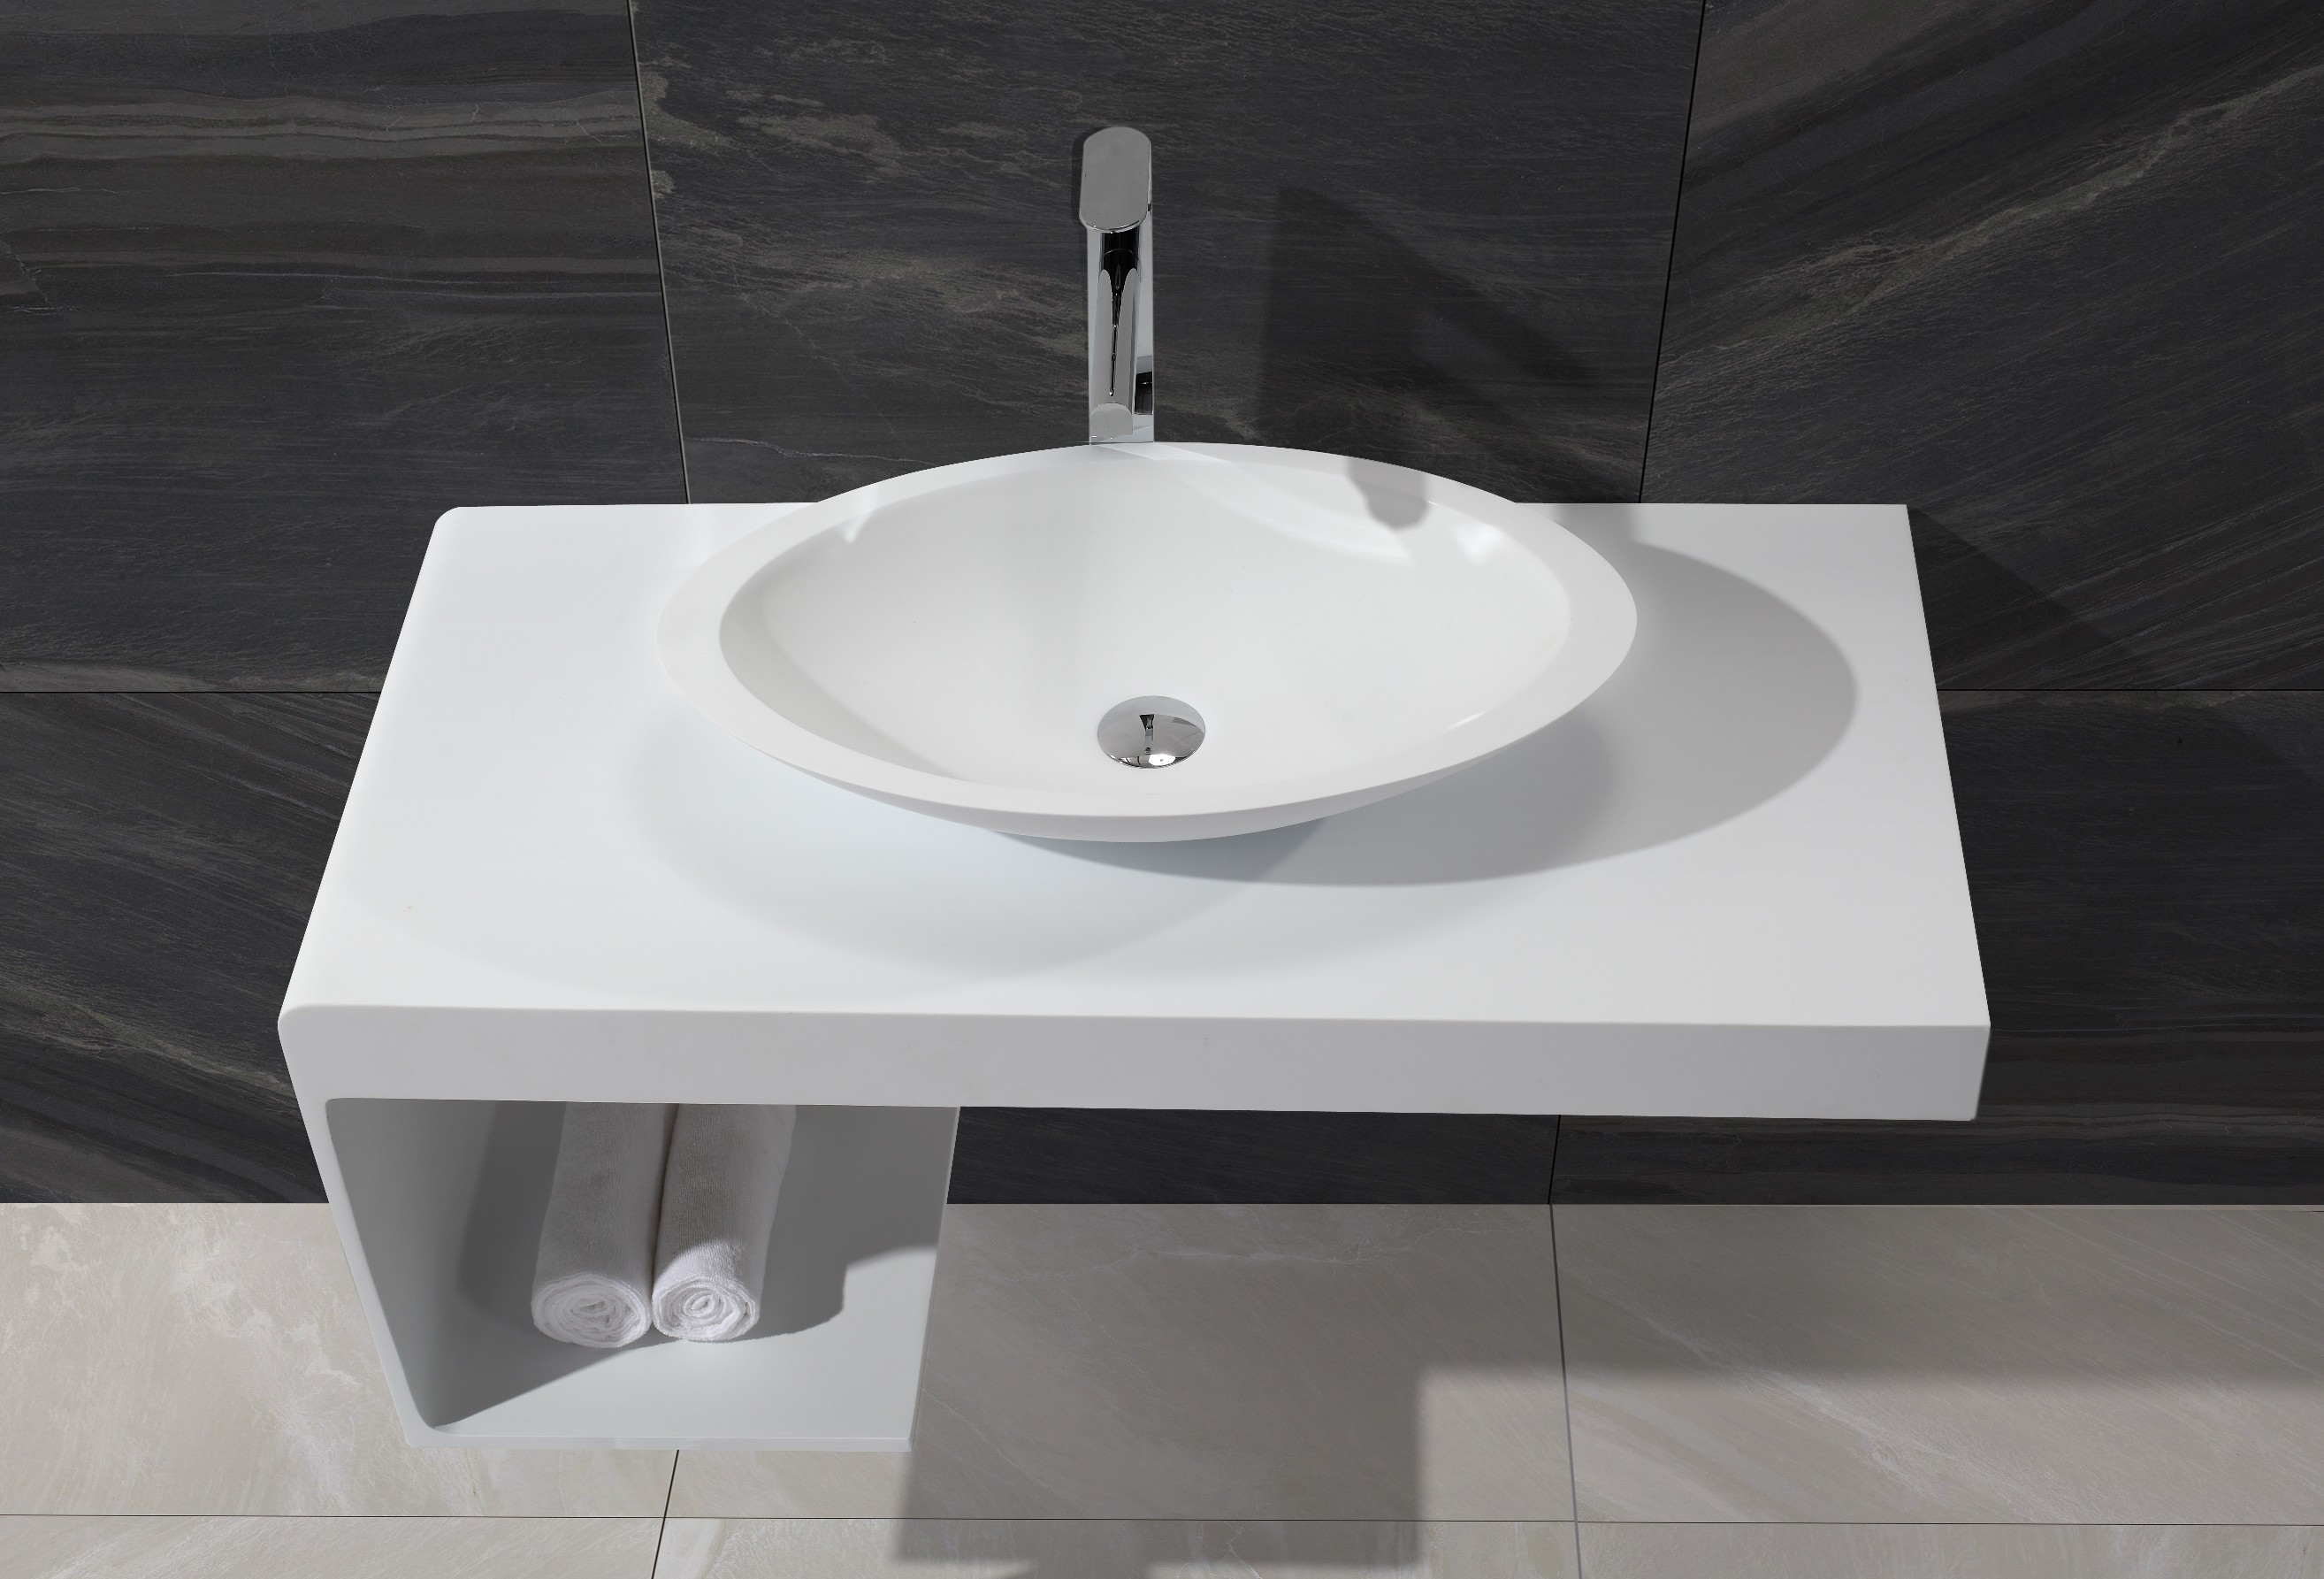 Design waschtischplatte 1396 badewelt badezimmer m bel for Design waschtisch